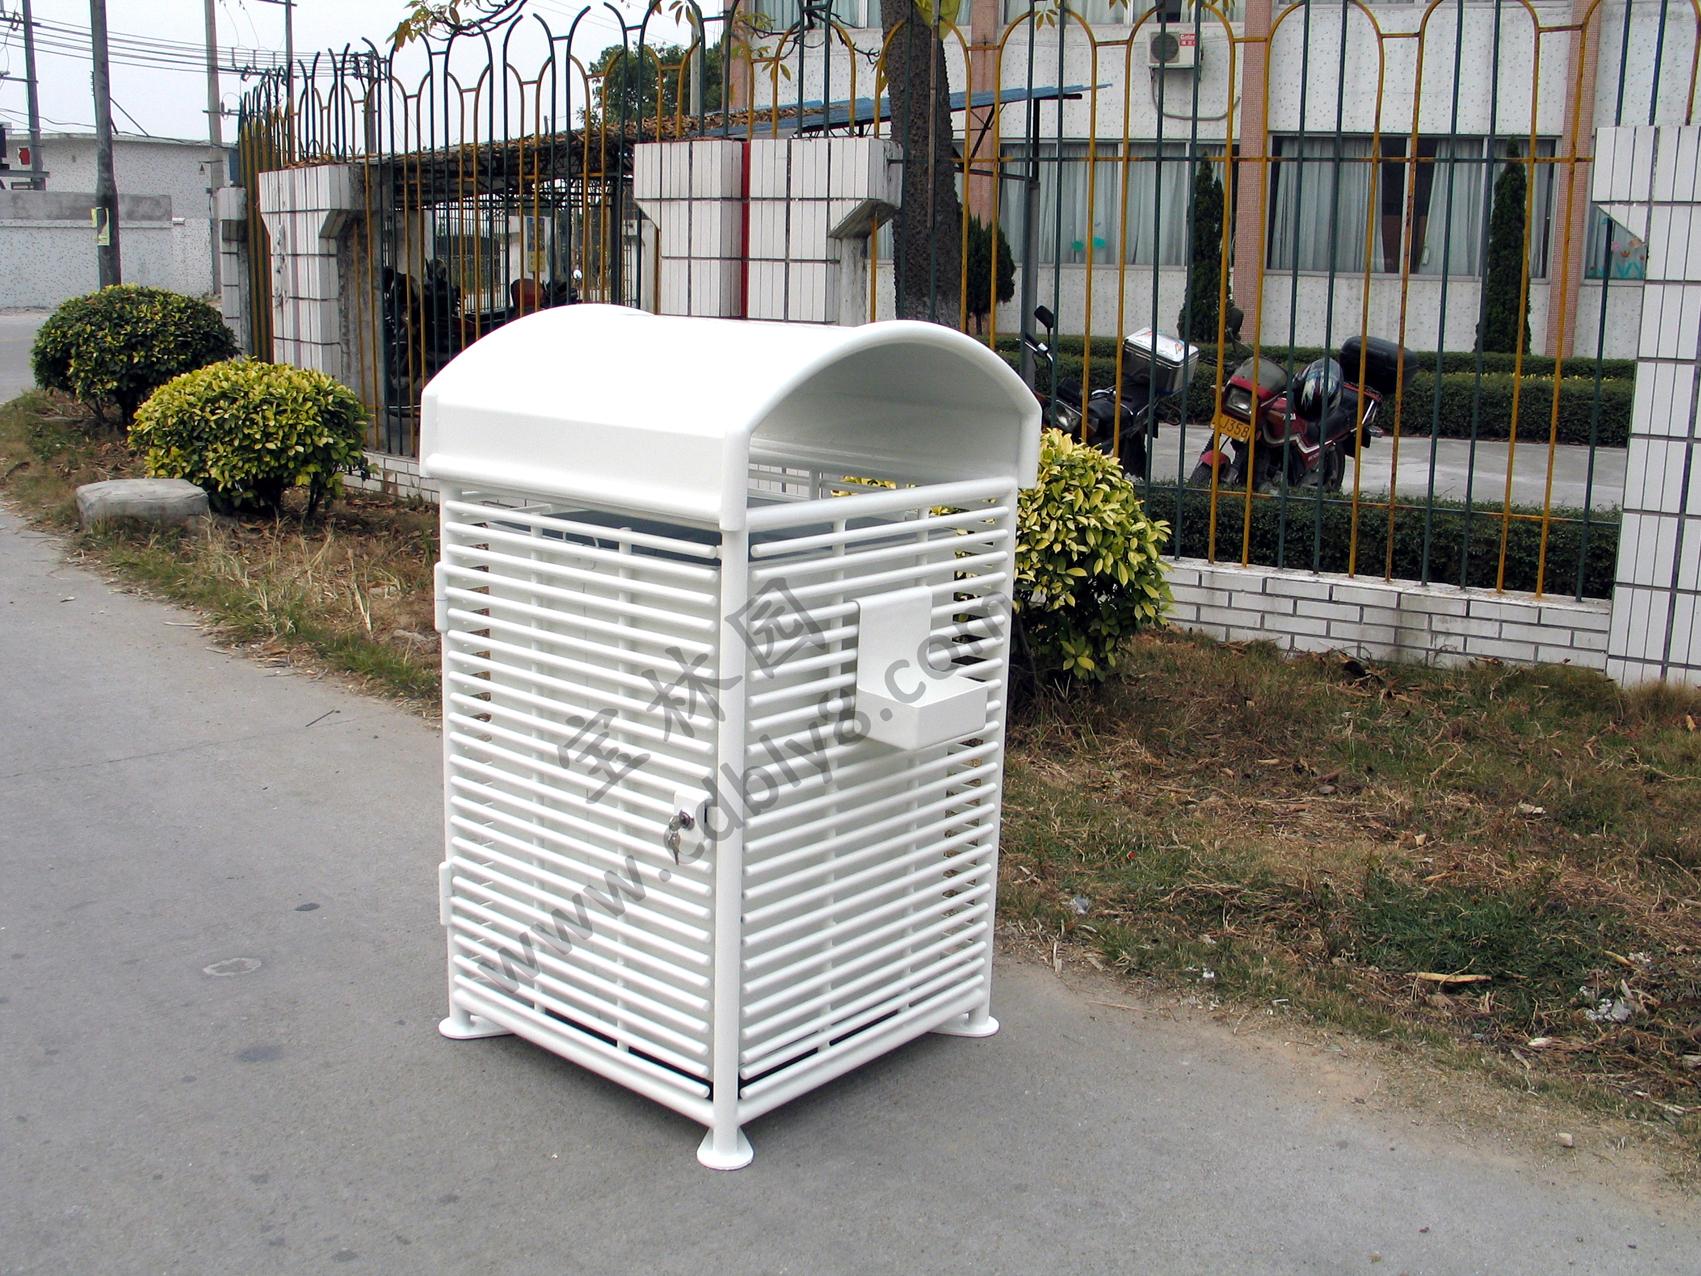 BB1-027全钢单桶垃圾桶